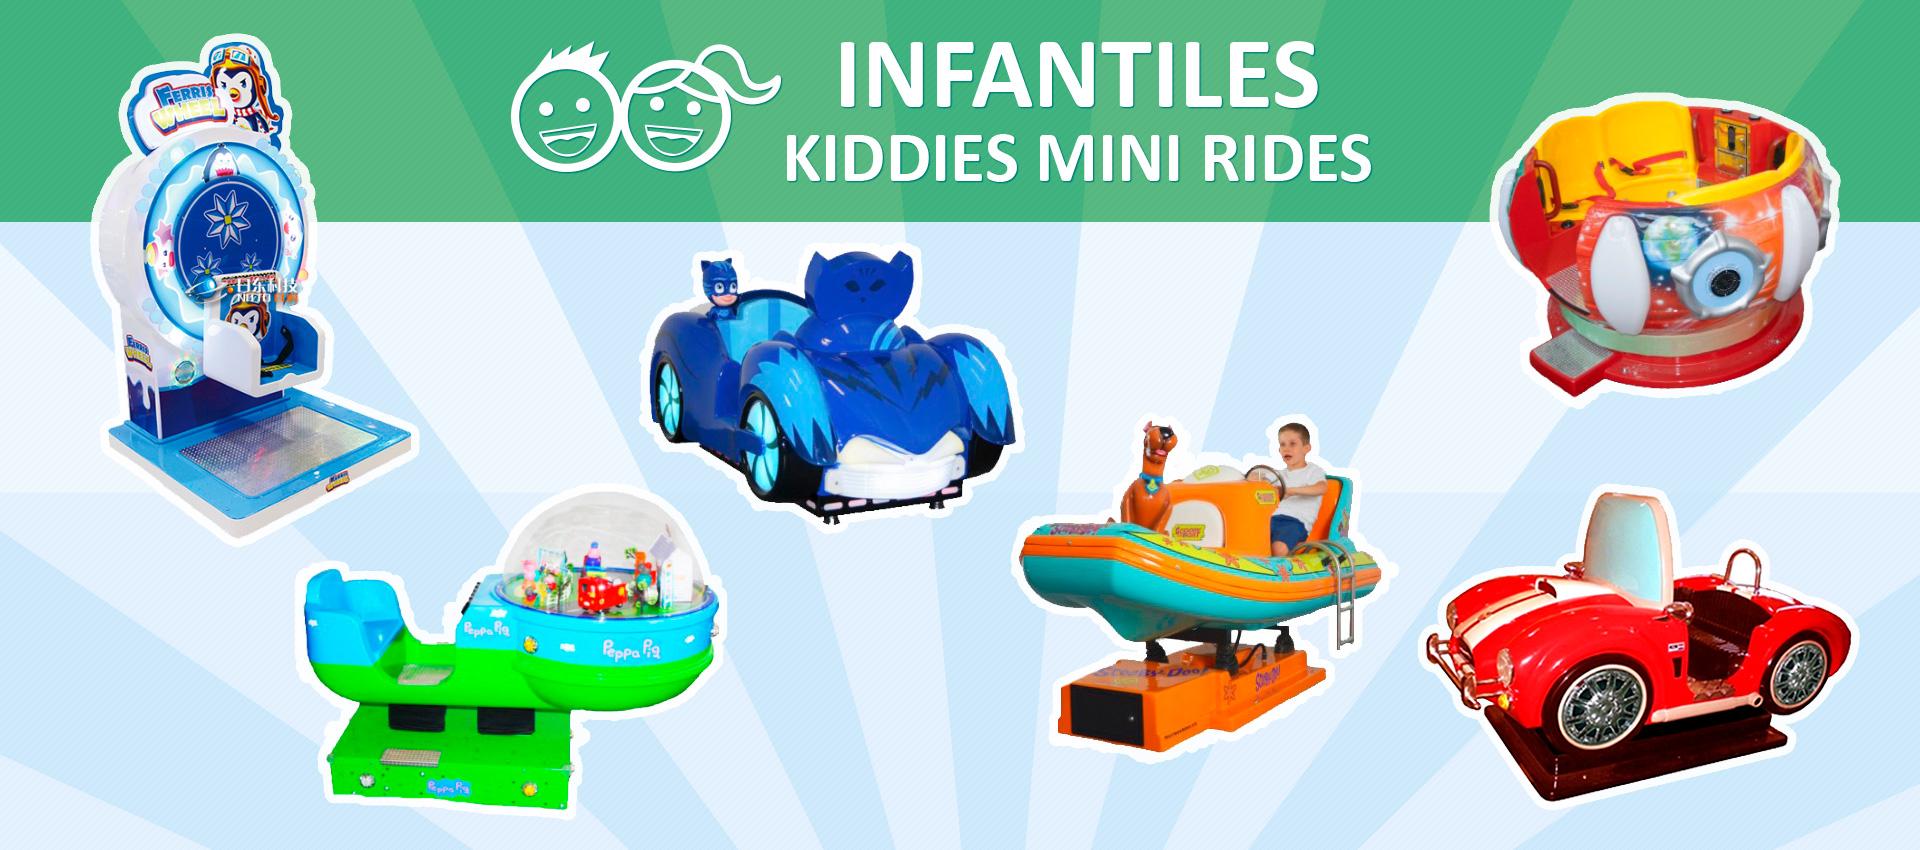 Infantiles Kiddies Mini Rides